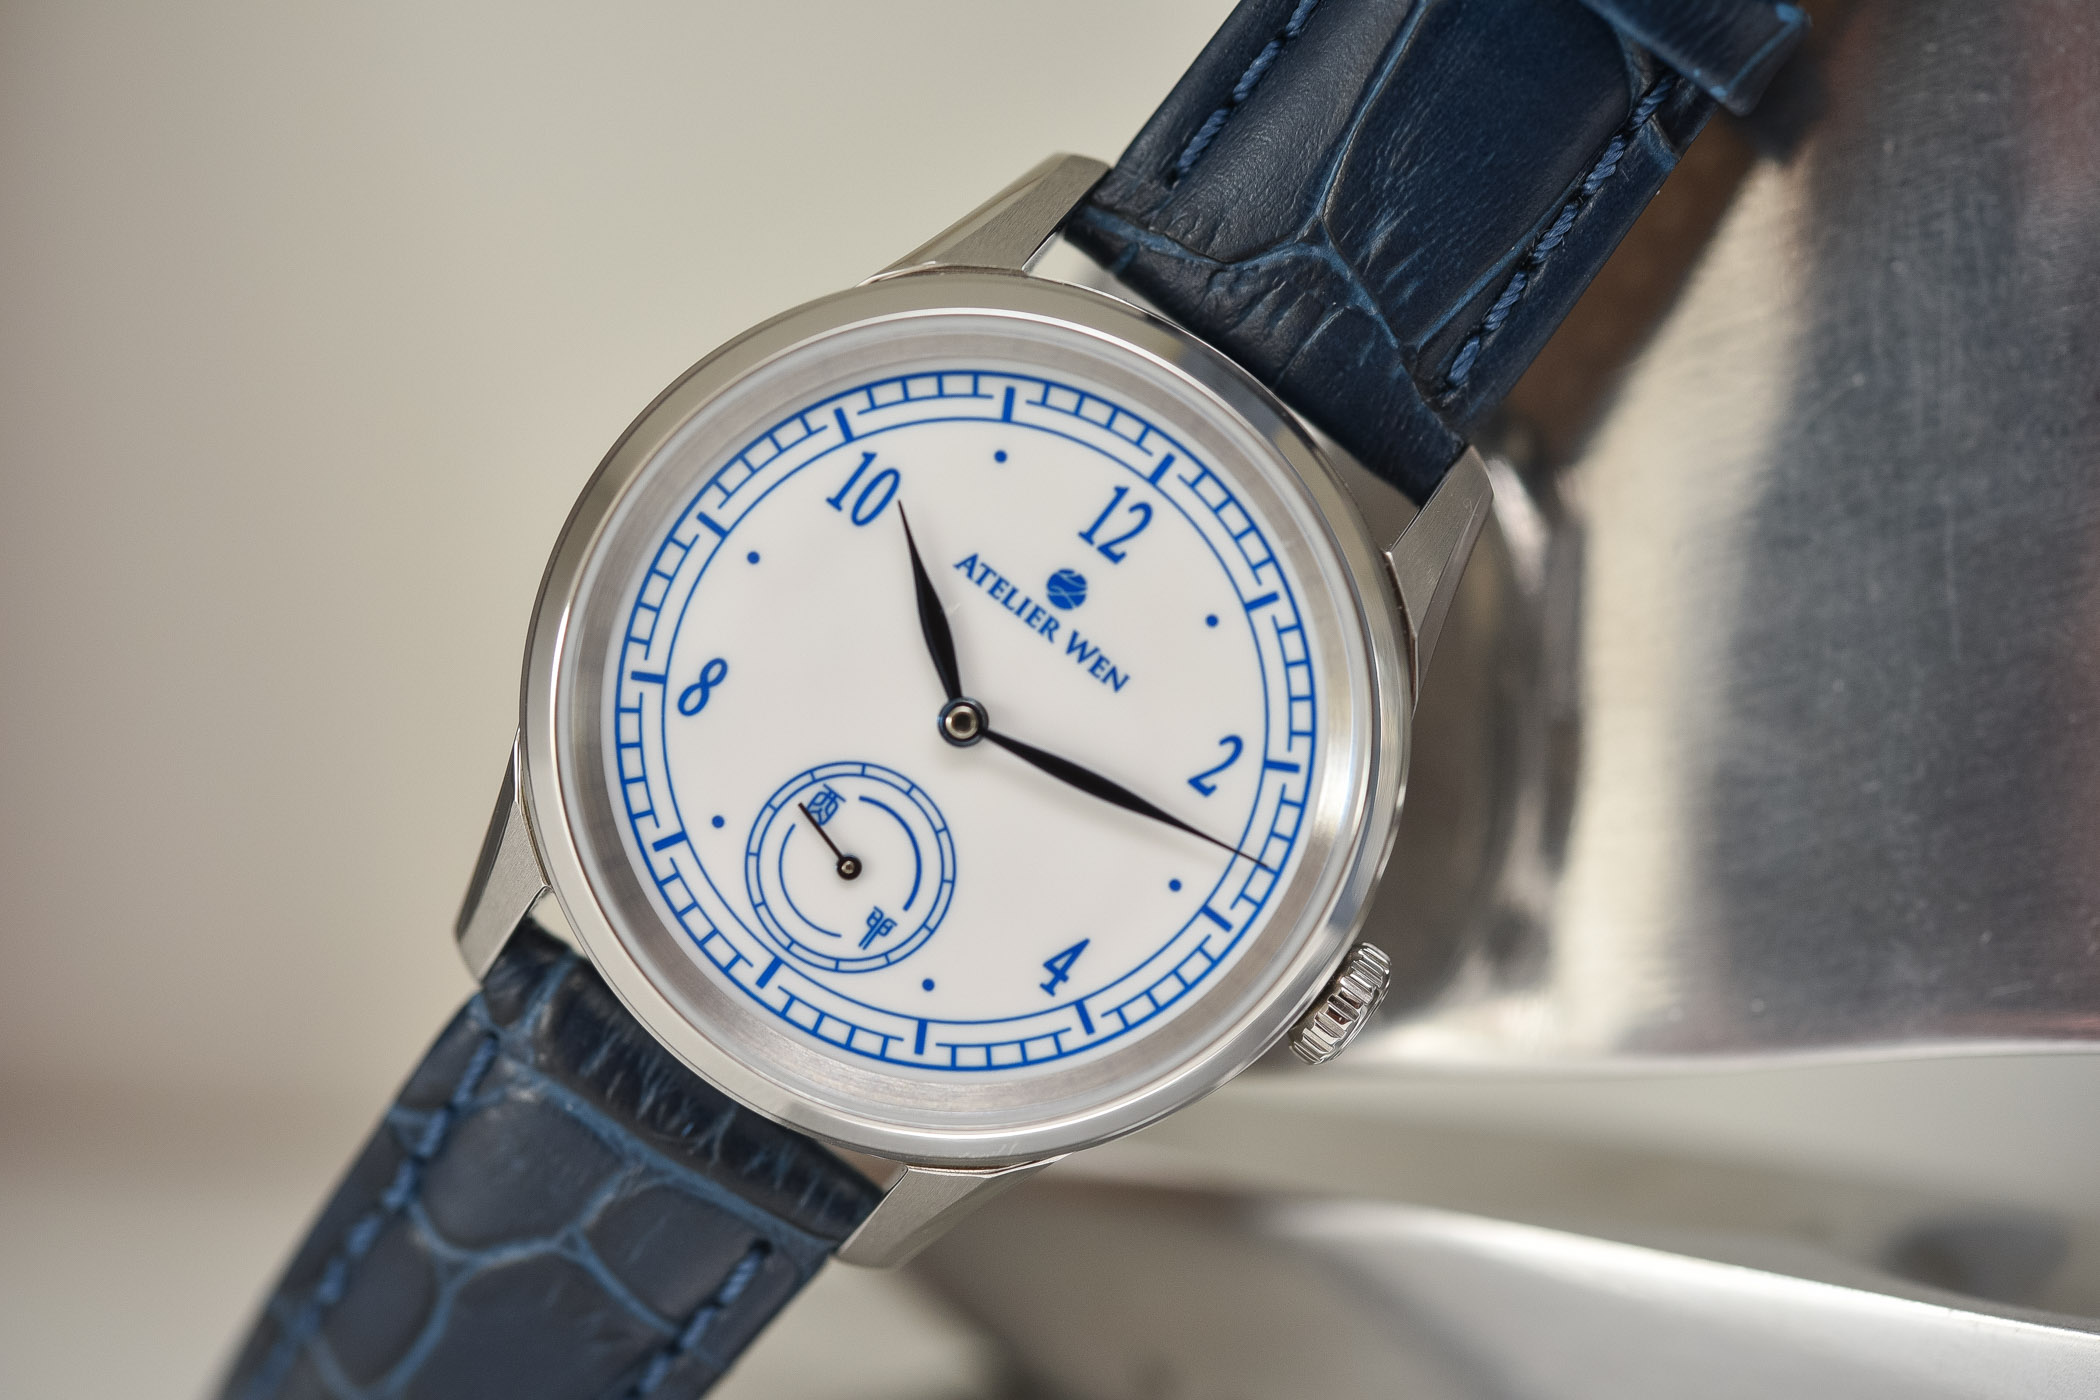 Atelier Wen Procelain dial China-inspired Watches Kickstarter - 3